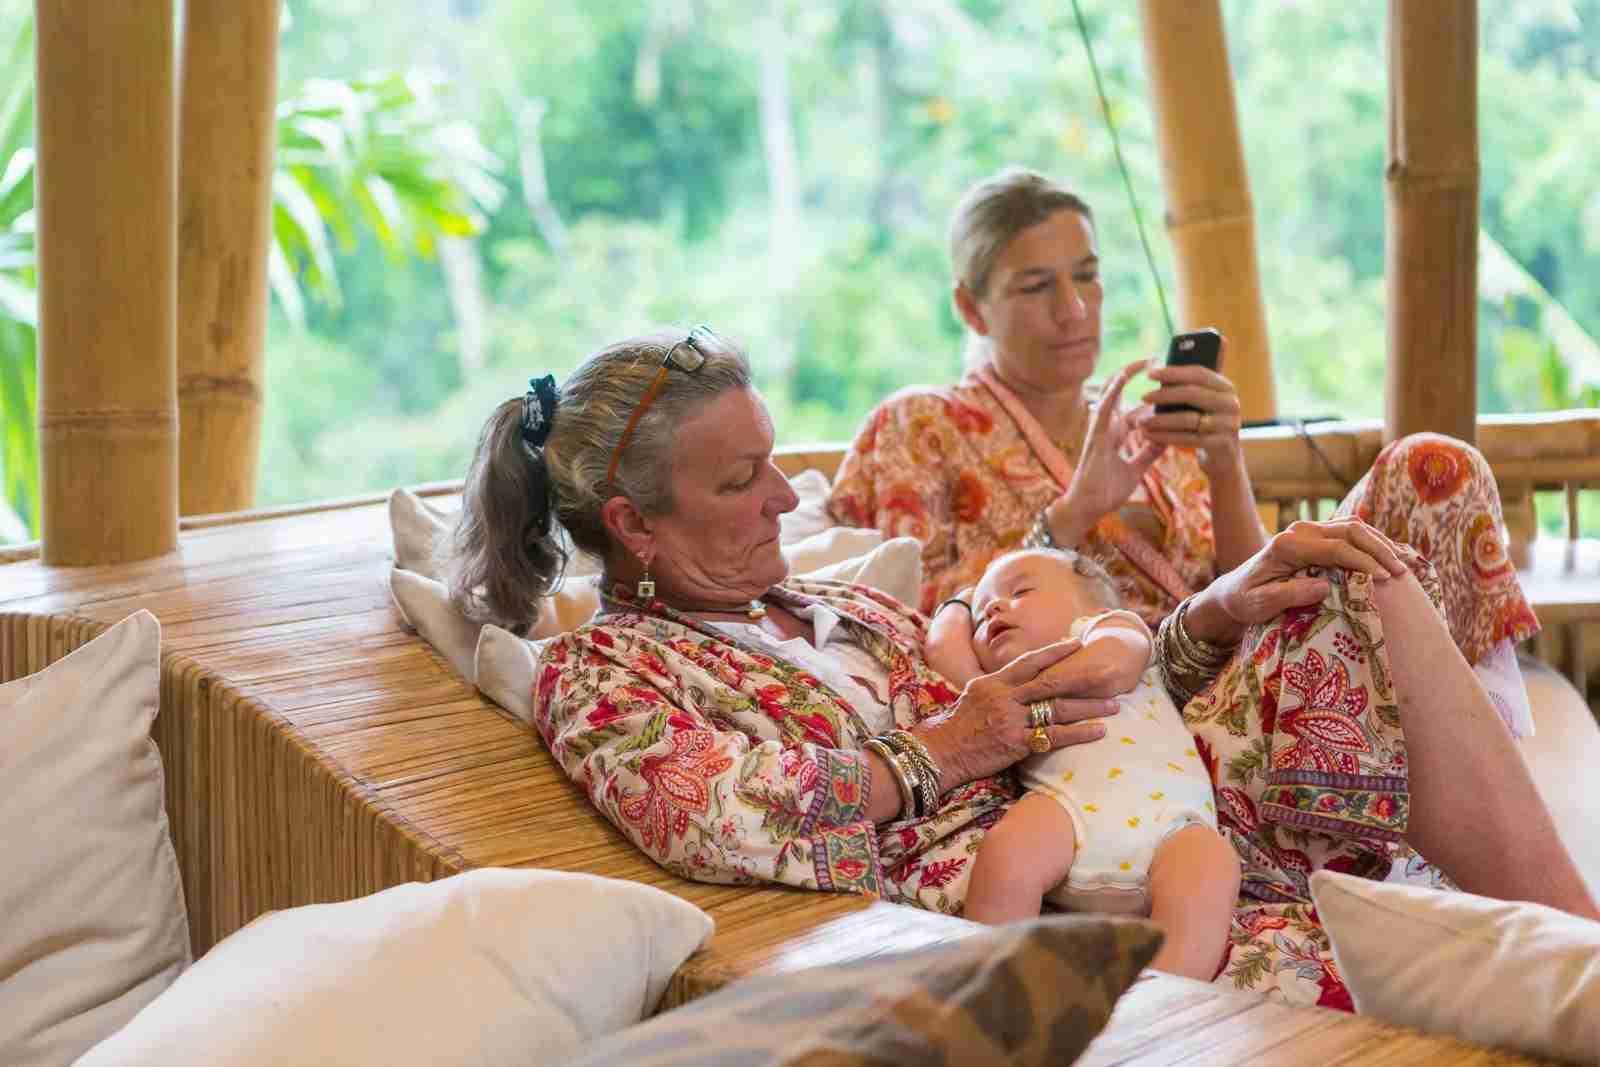 Bringing grandma (or grandpa) along might bring you more serenity than you think. (Photo via Getty Images)